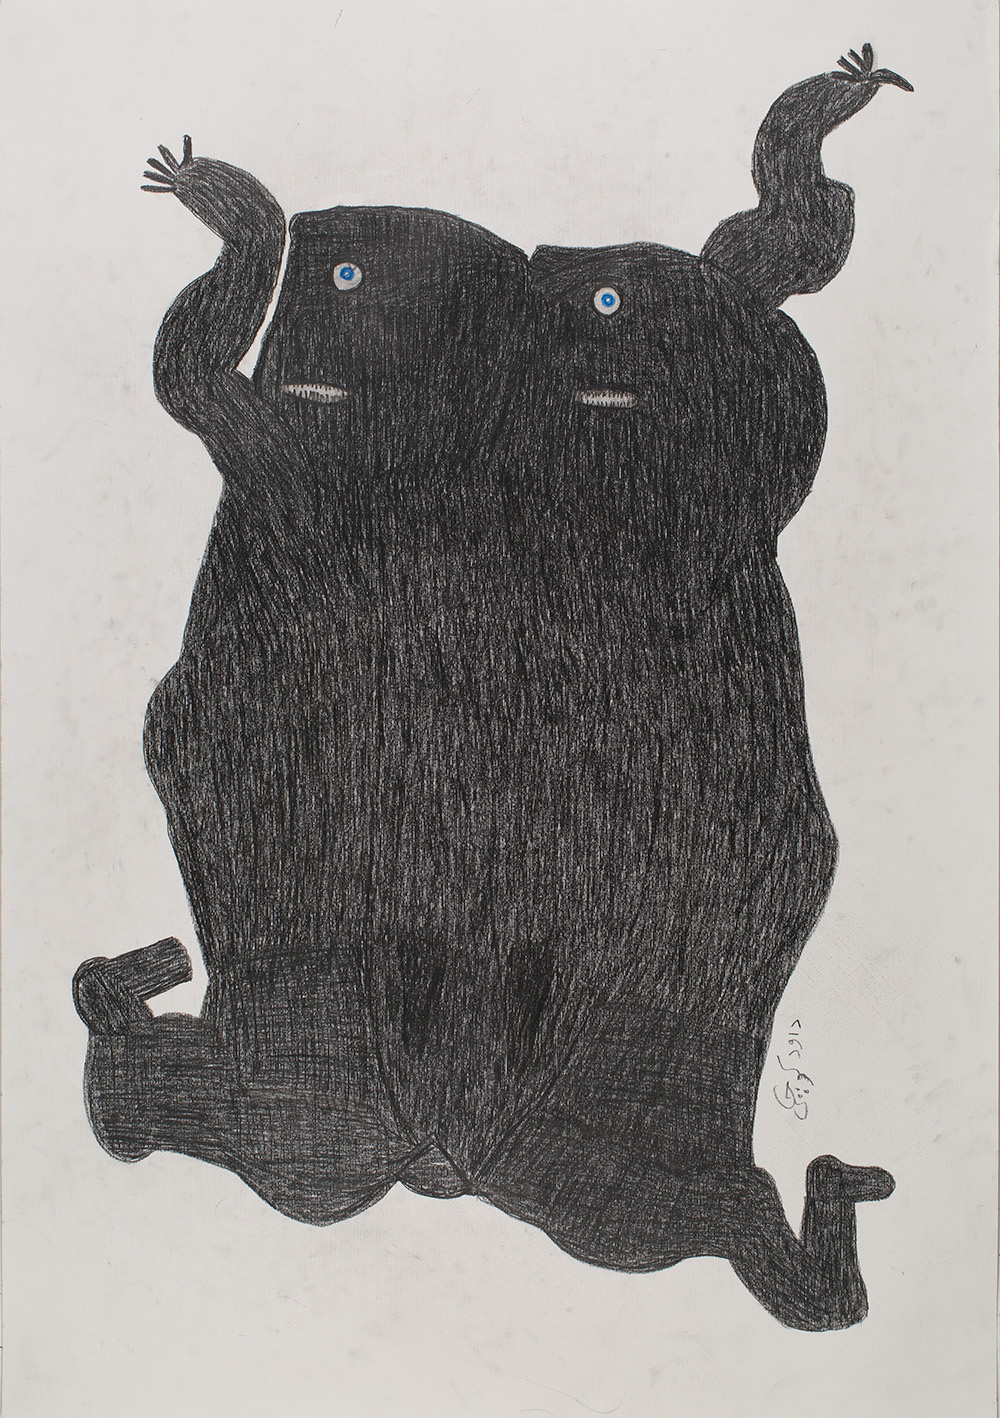 Davood Koochaki,  Untitled  , 2017-2018, Graphite on paper, 39 x 27.5 inches, 99.1 x 69.9 cm, DKoo 23